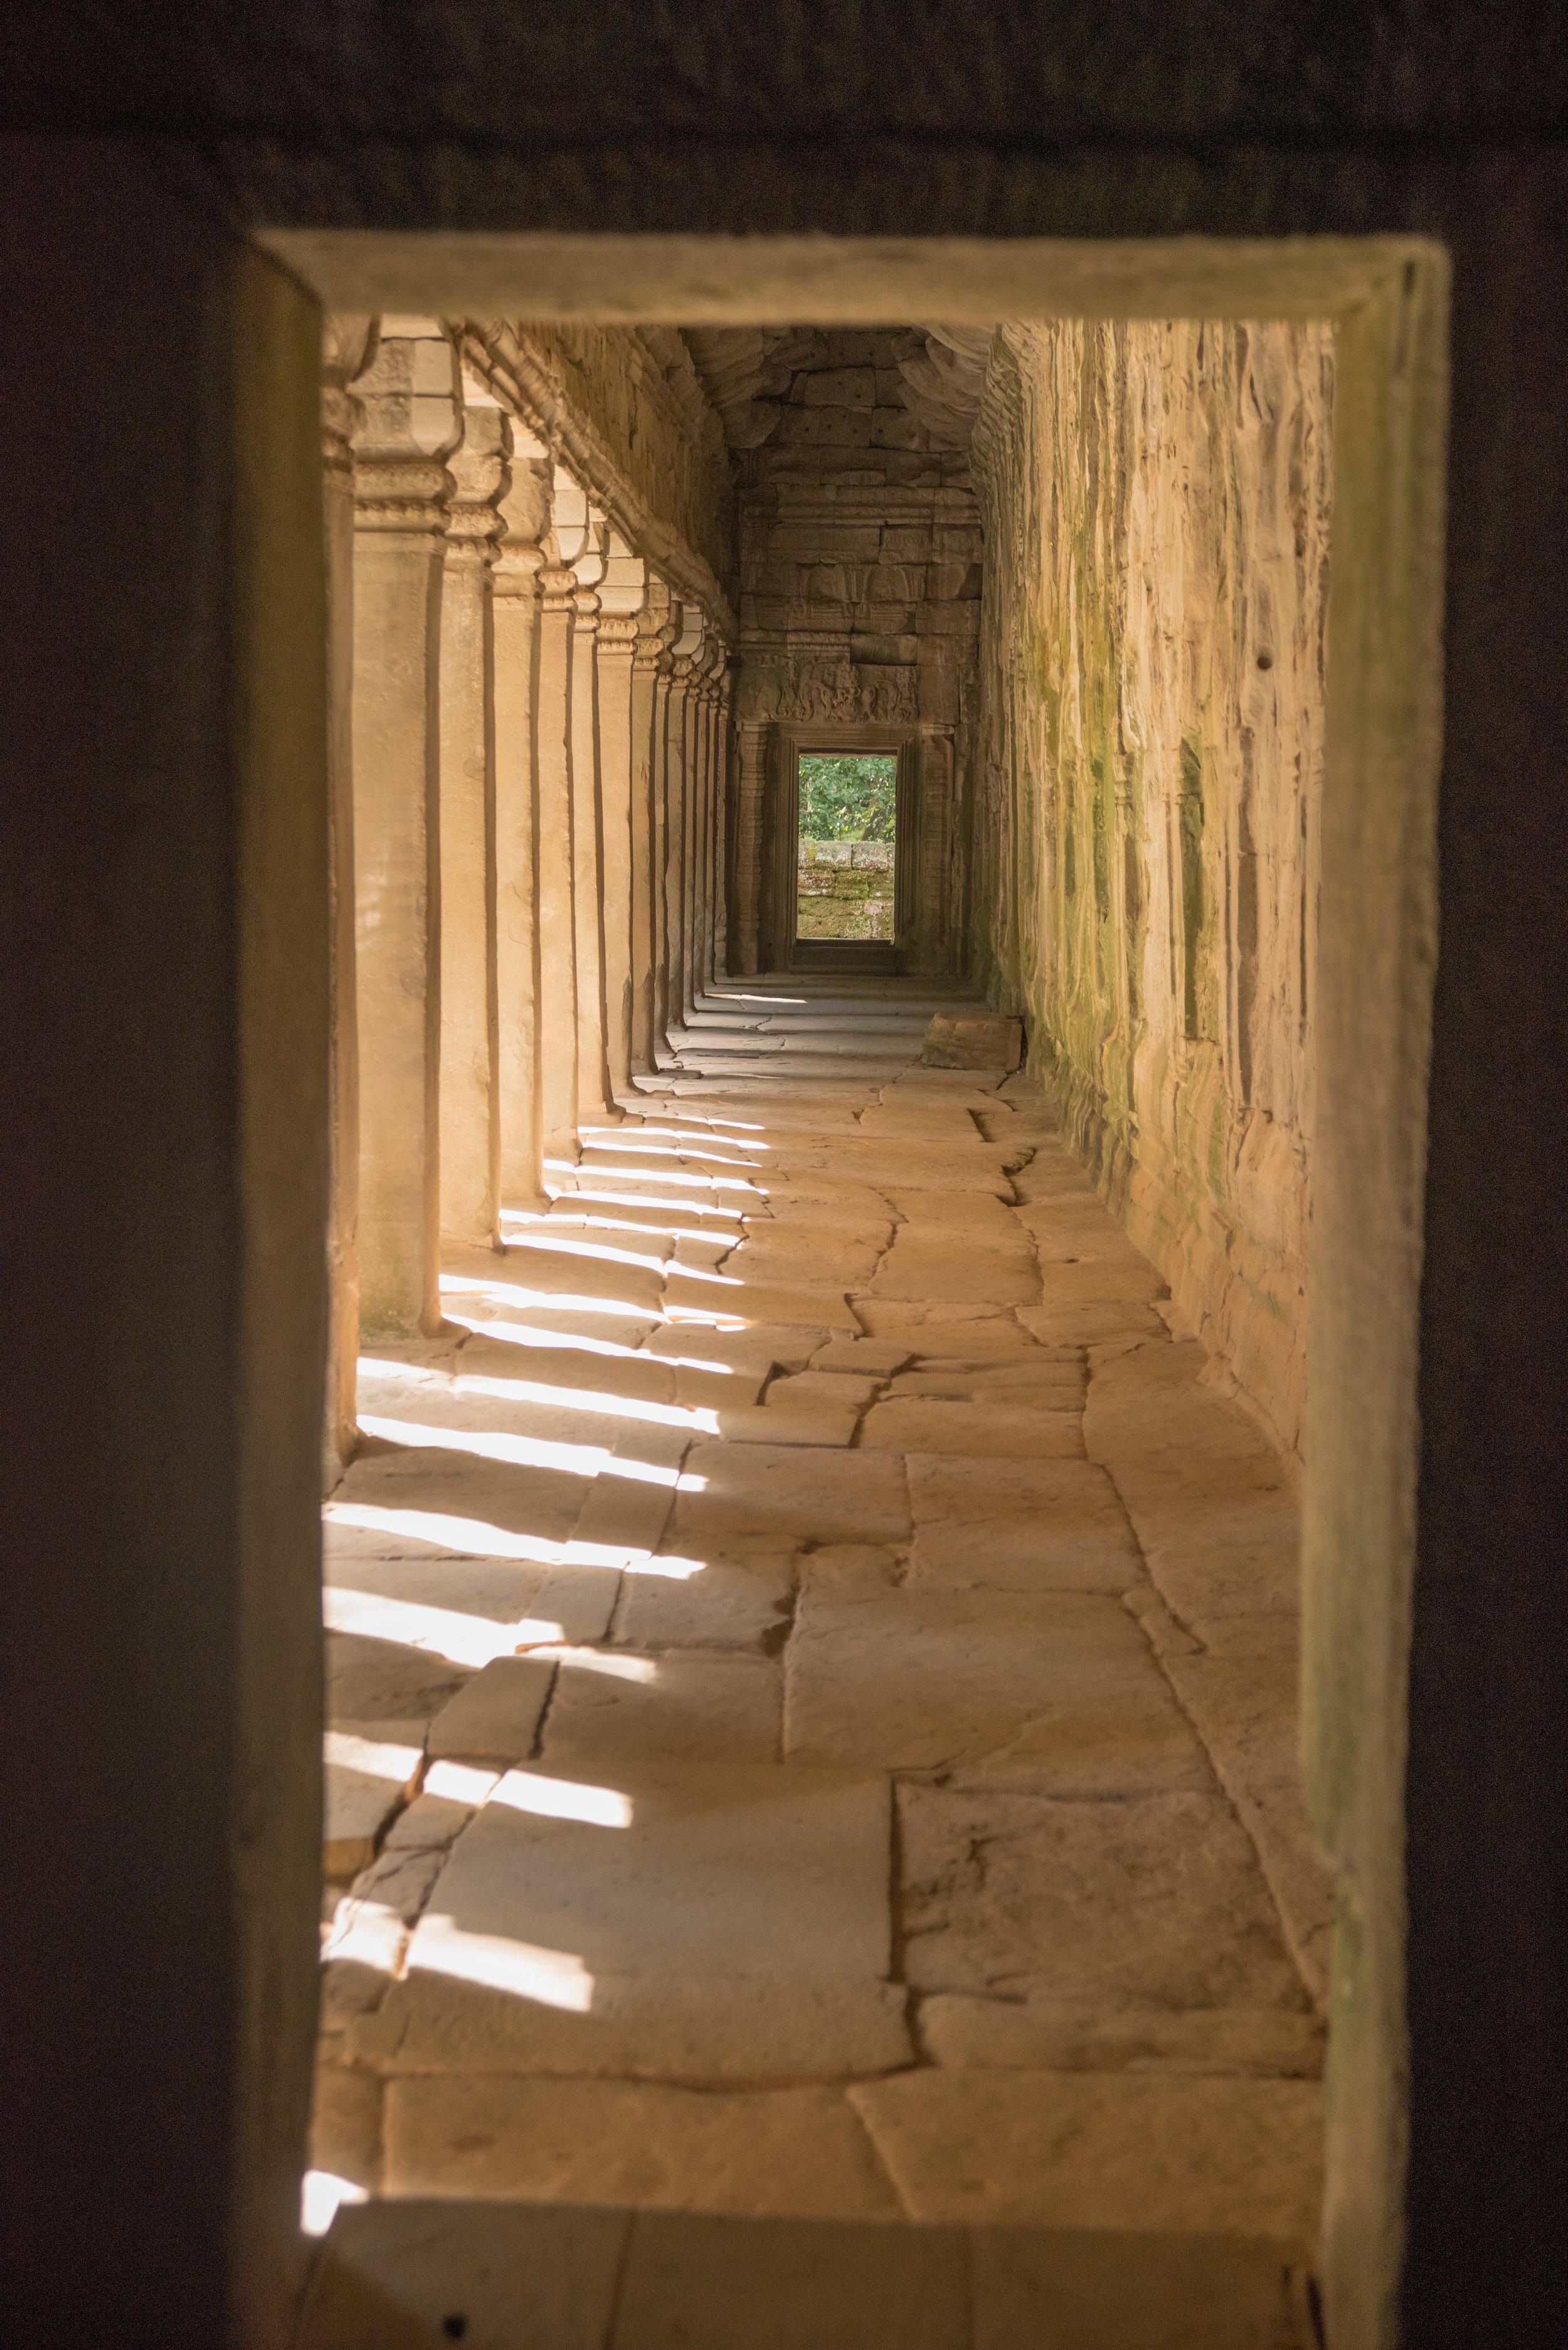 Gallery, Ta Prohm Temple, Siem Reap, Cambodia